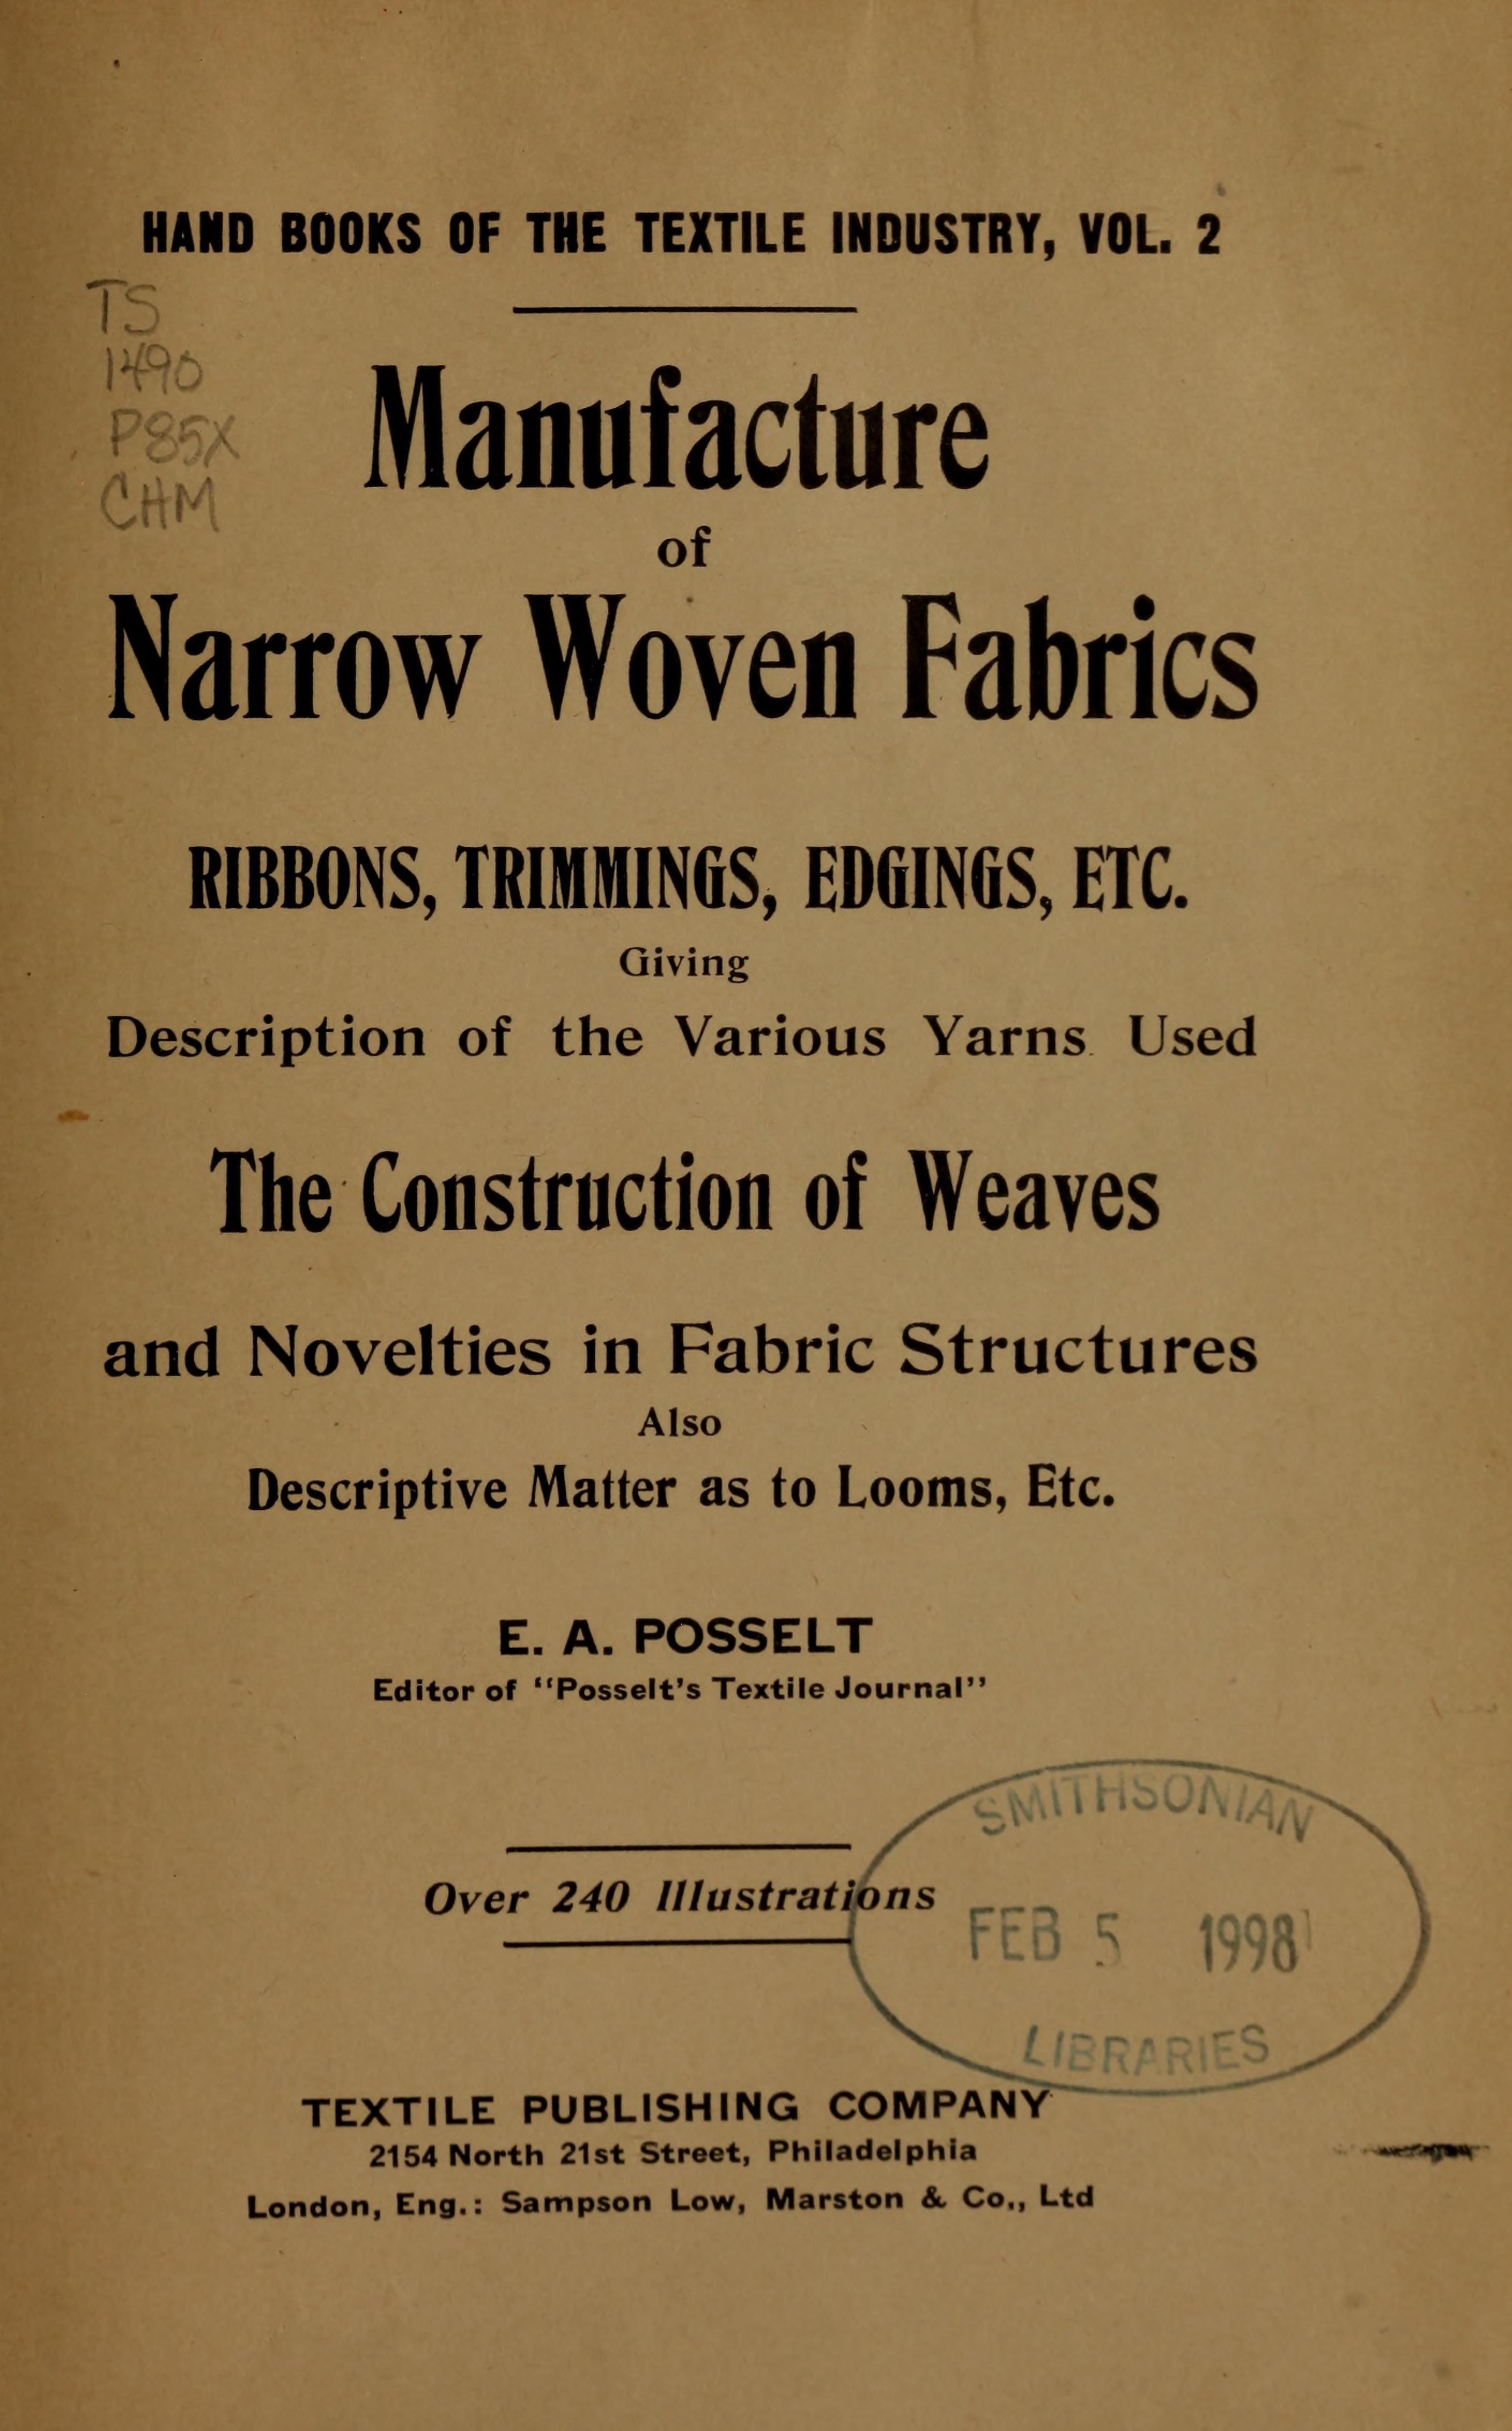 Manufacture of narrow woven fabrics, ribbons, trimmings, edgings, etc.